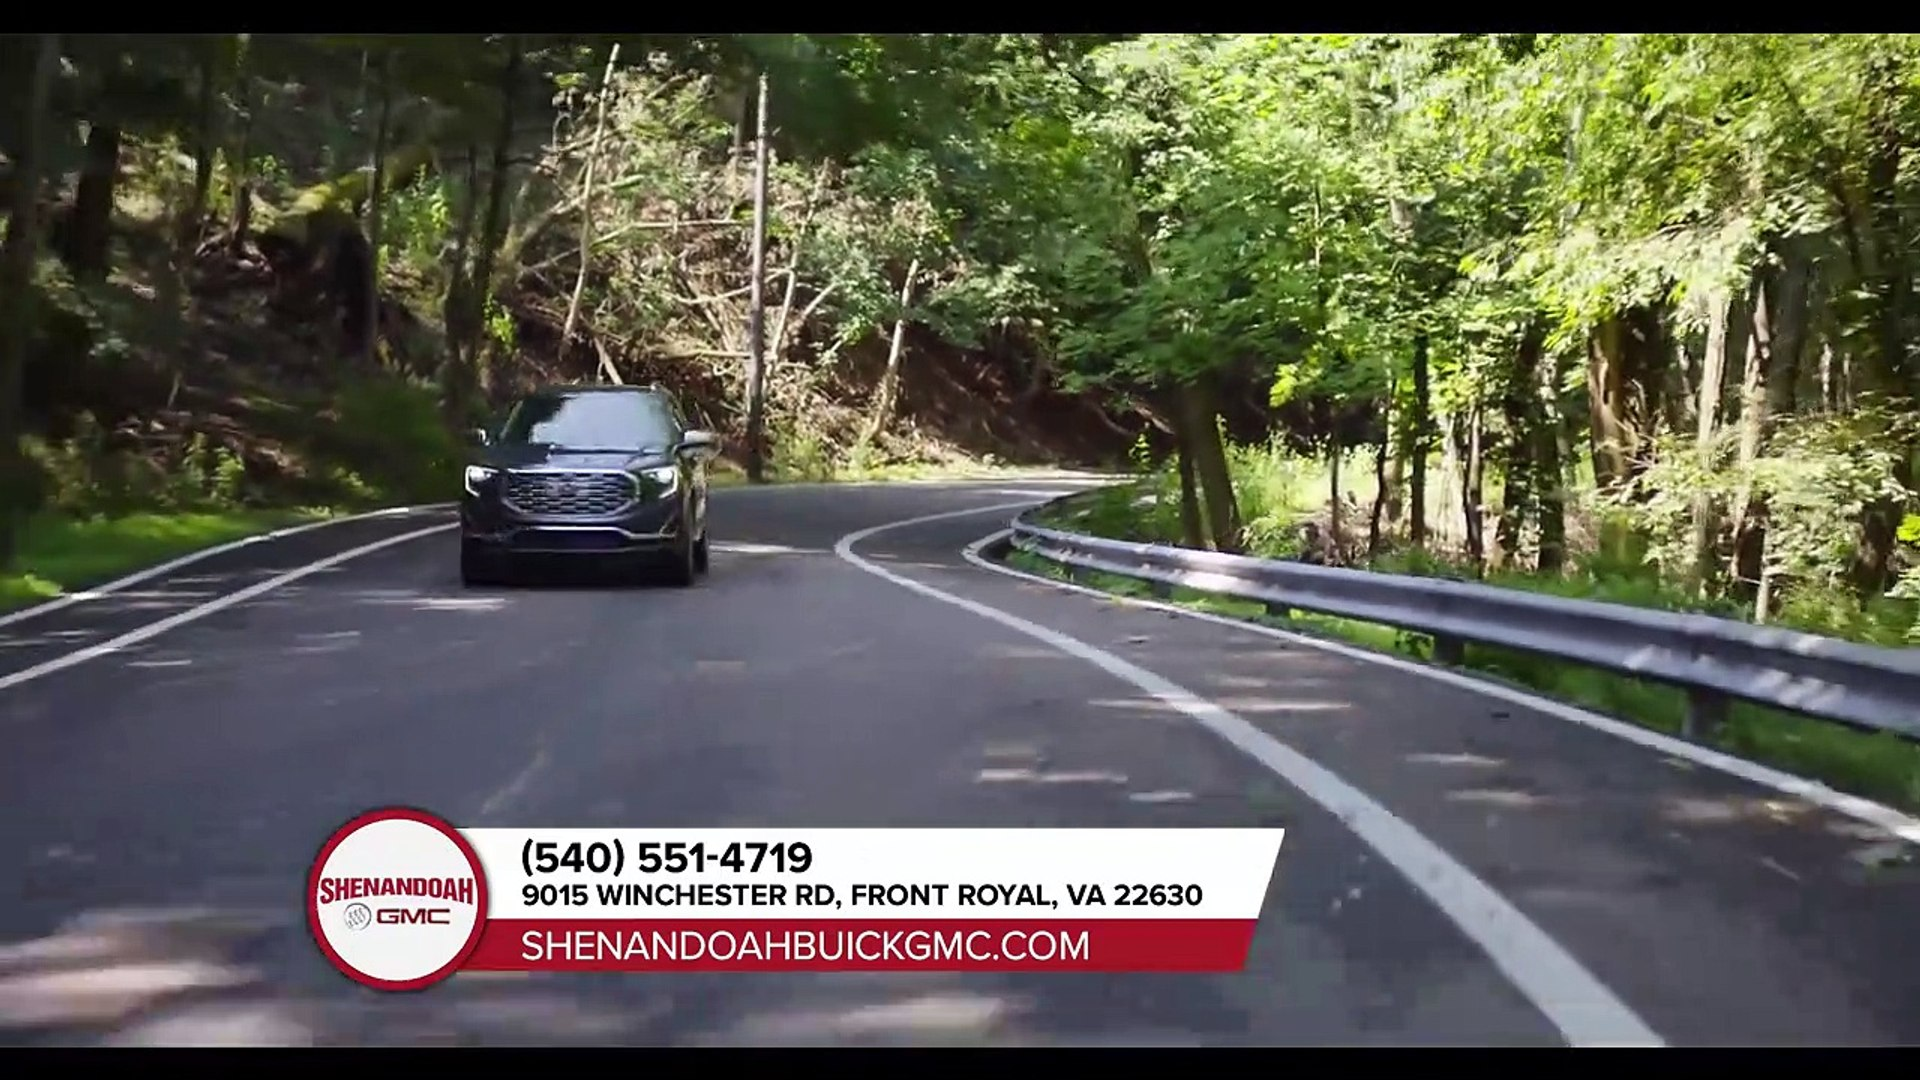 2019 GMC Terrain Front Royal VA | New GMC Terrain Front Royal VA